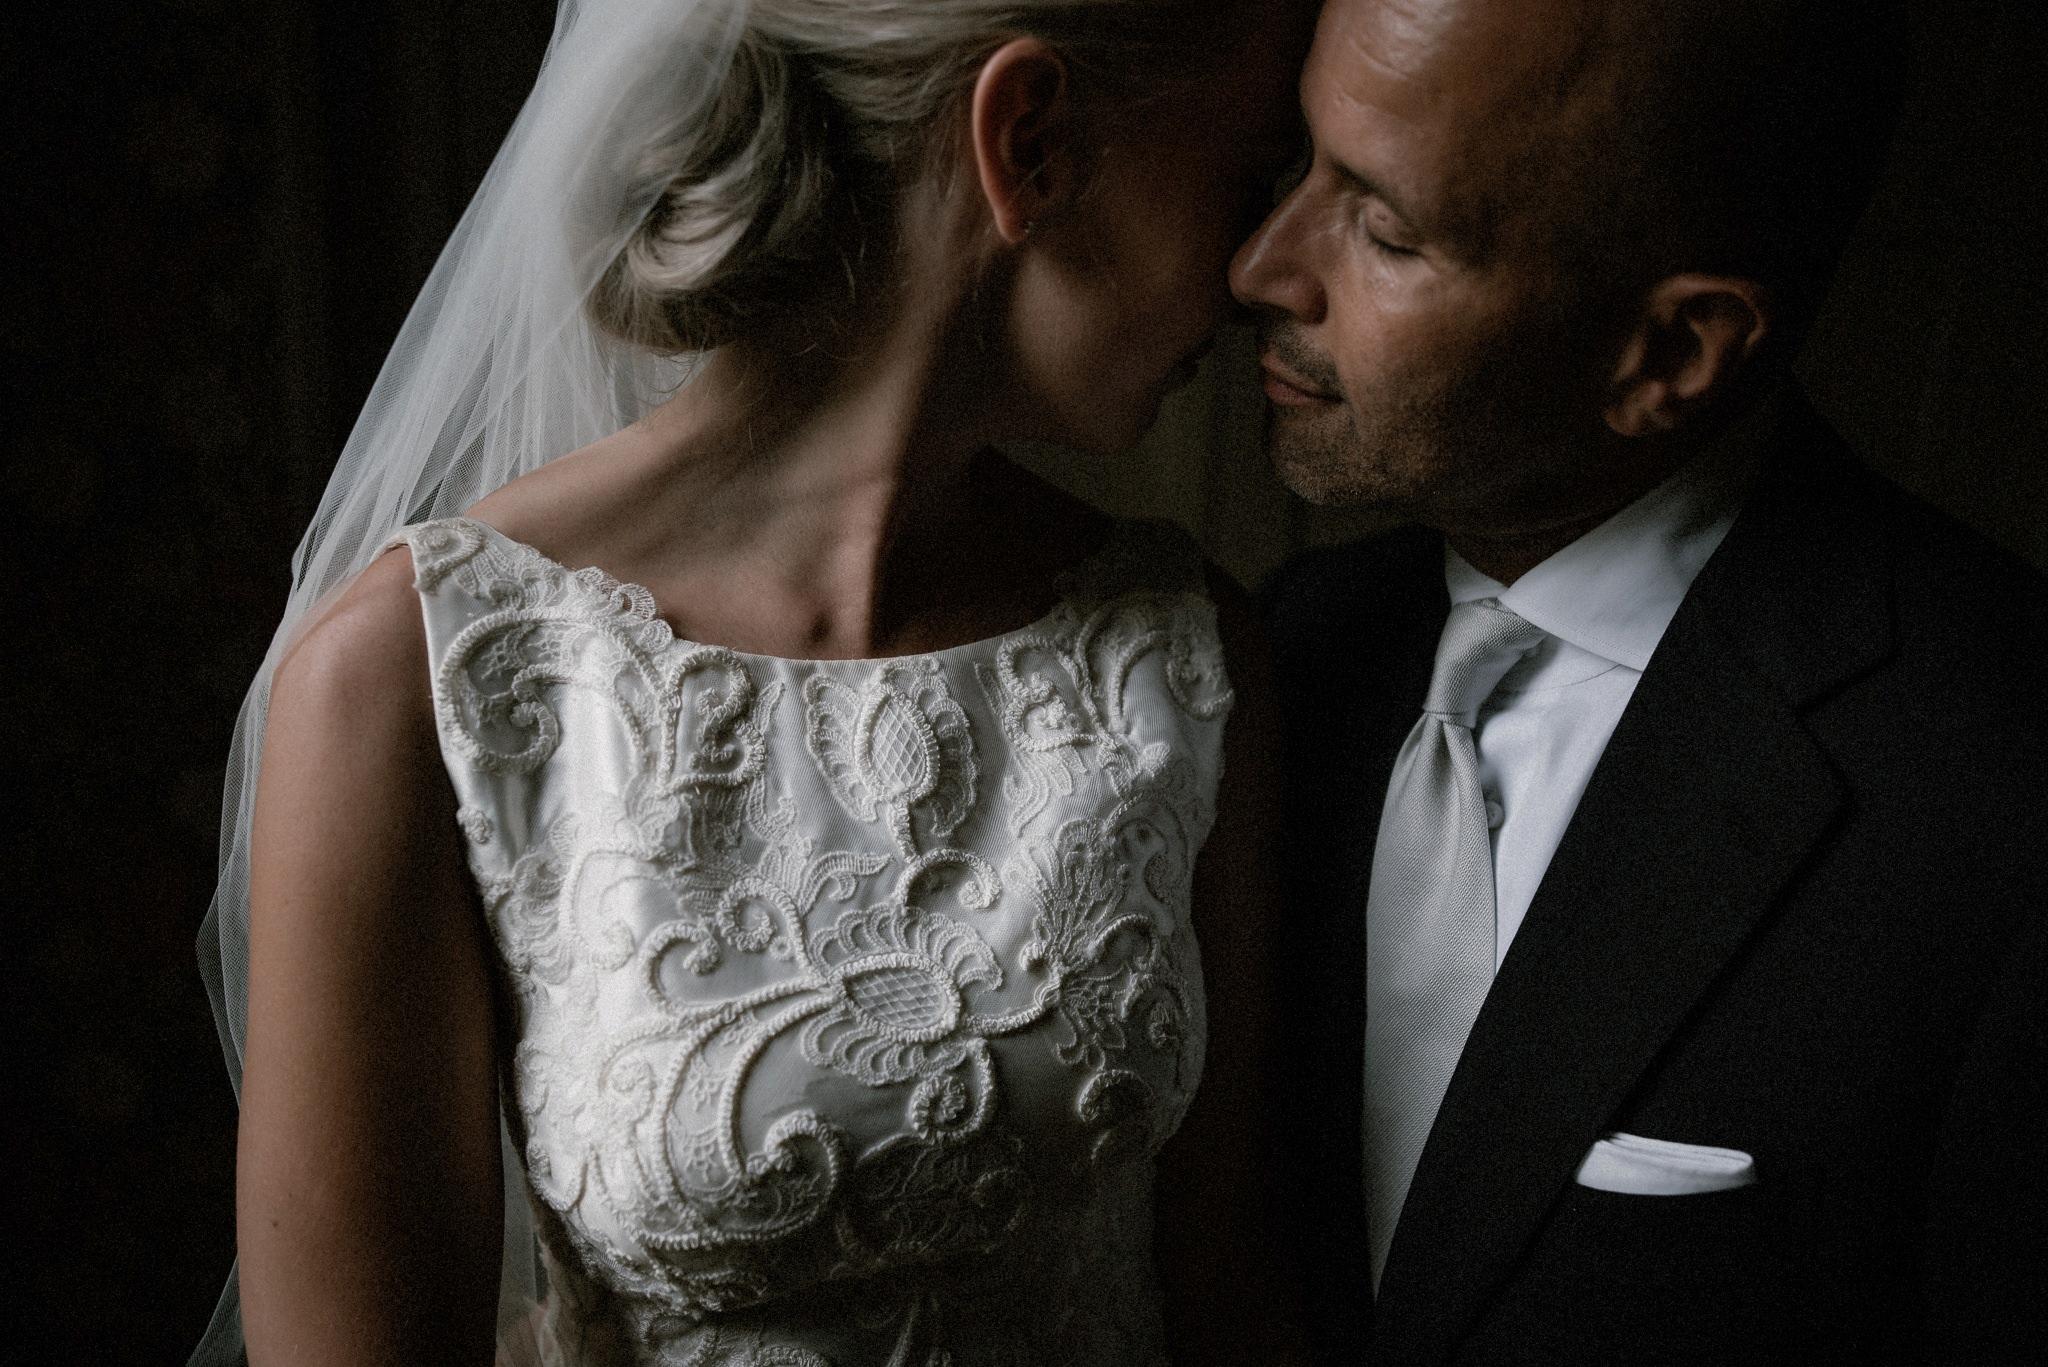 Bruidsfotografie Buitenplaats Sparrendaal - Naomi van der Kraan 0060.jpg